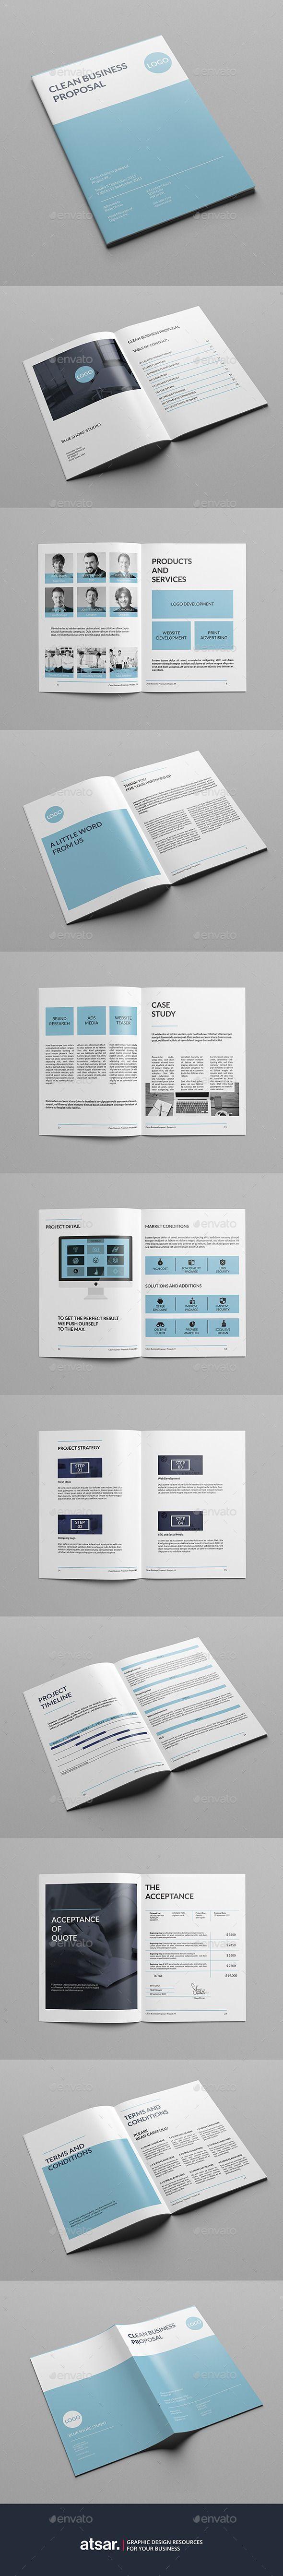 Business infographic : Business infographic : Business infographic : Business infographic : Clean Busin